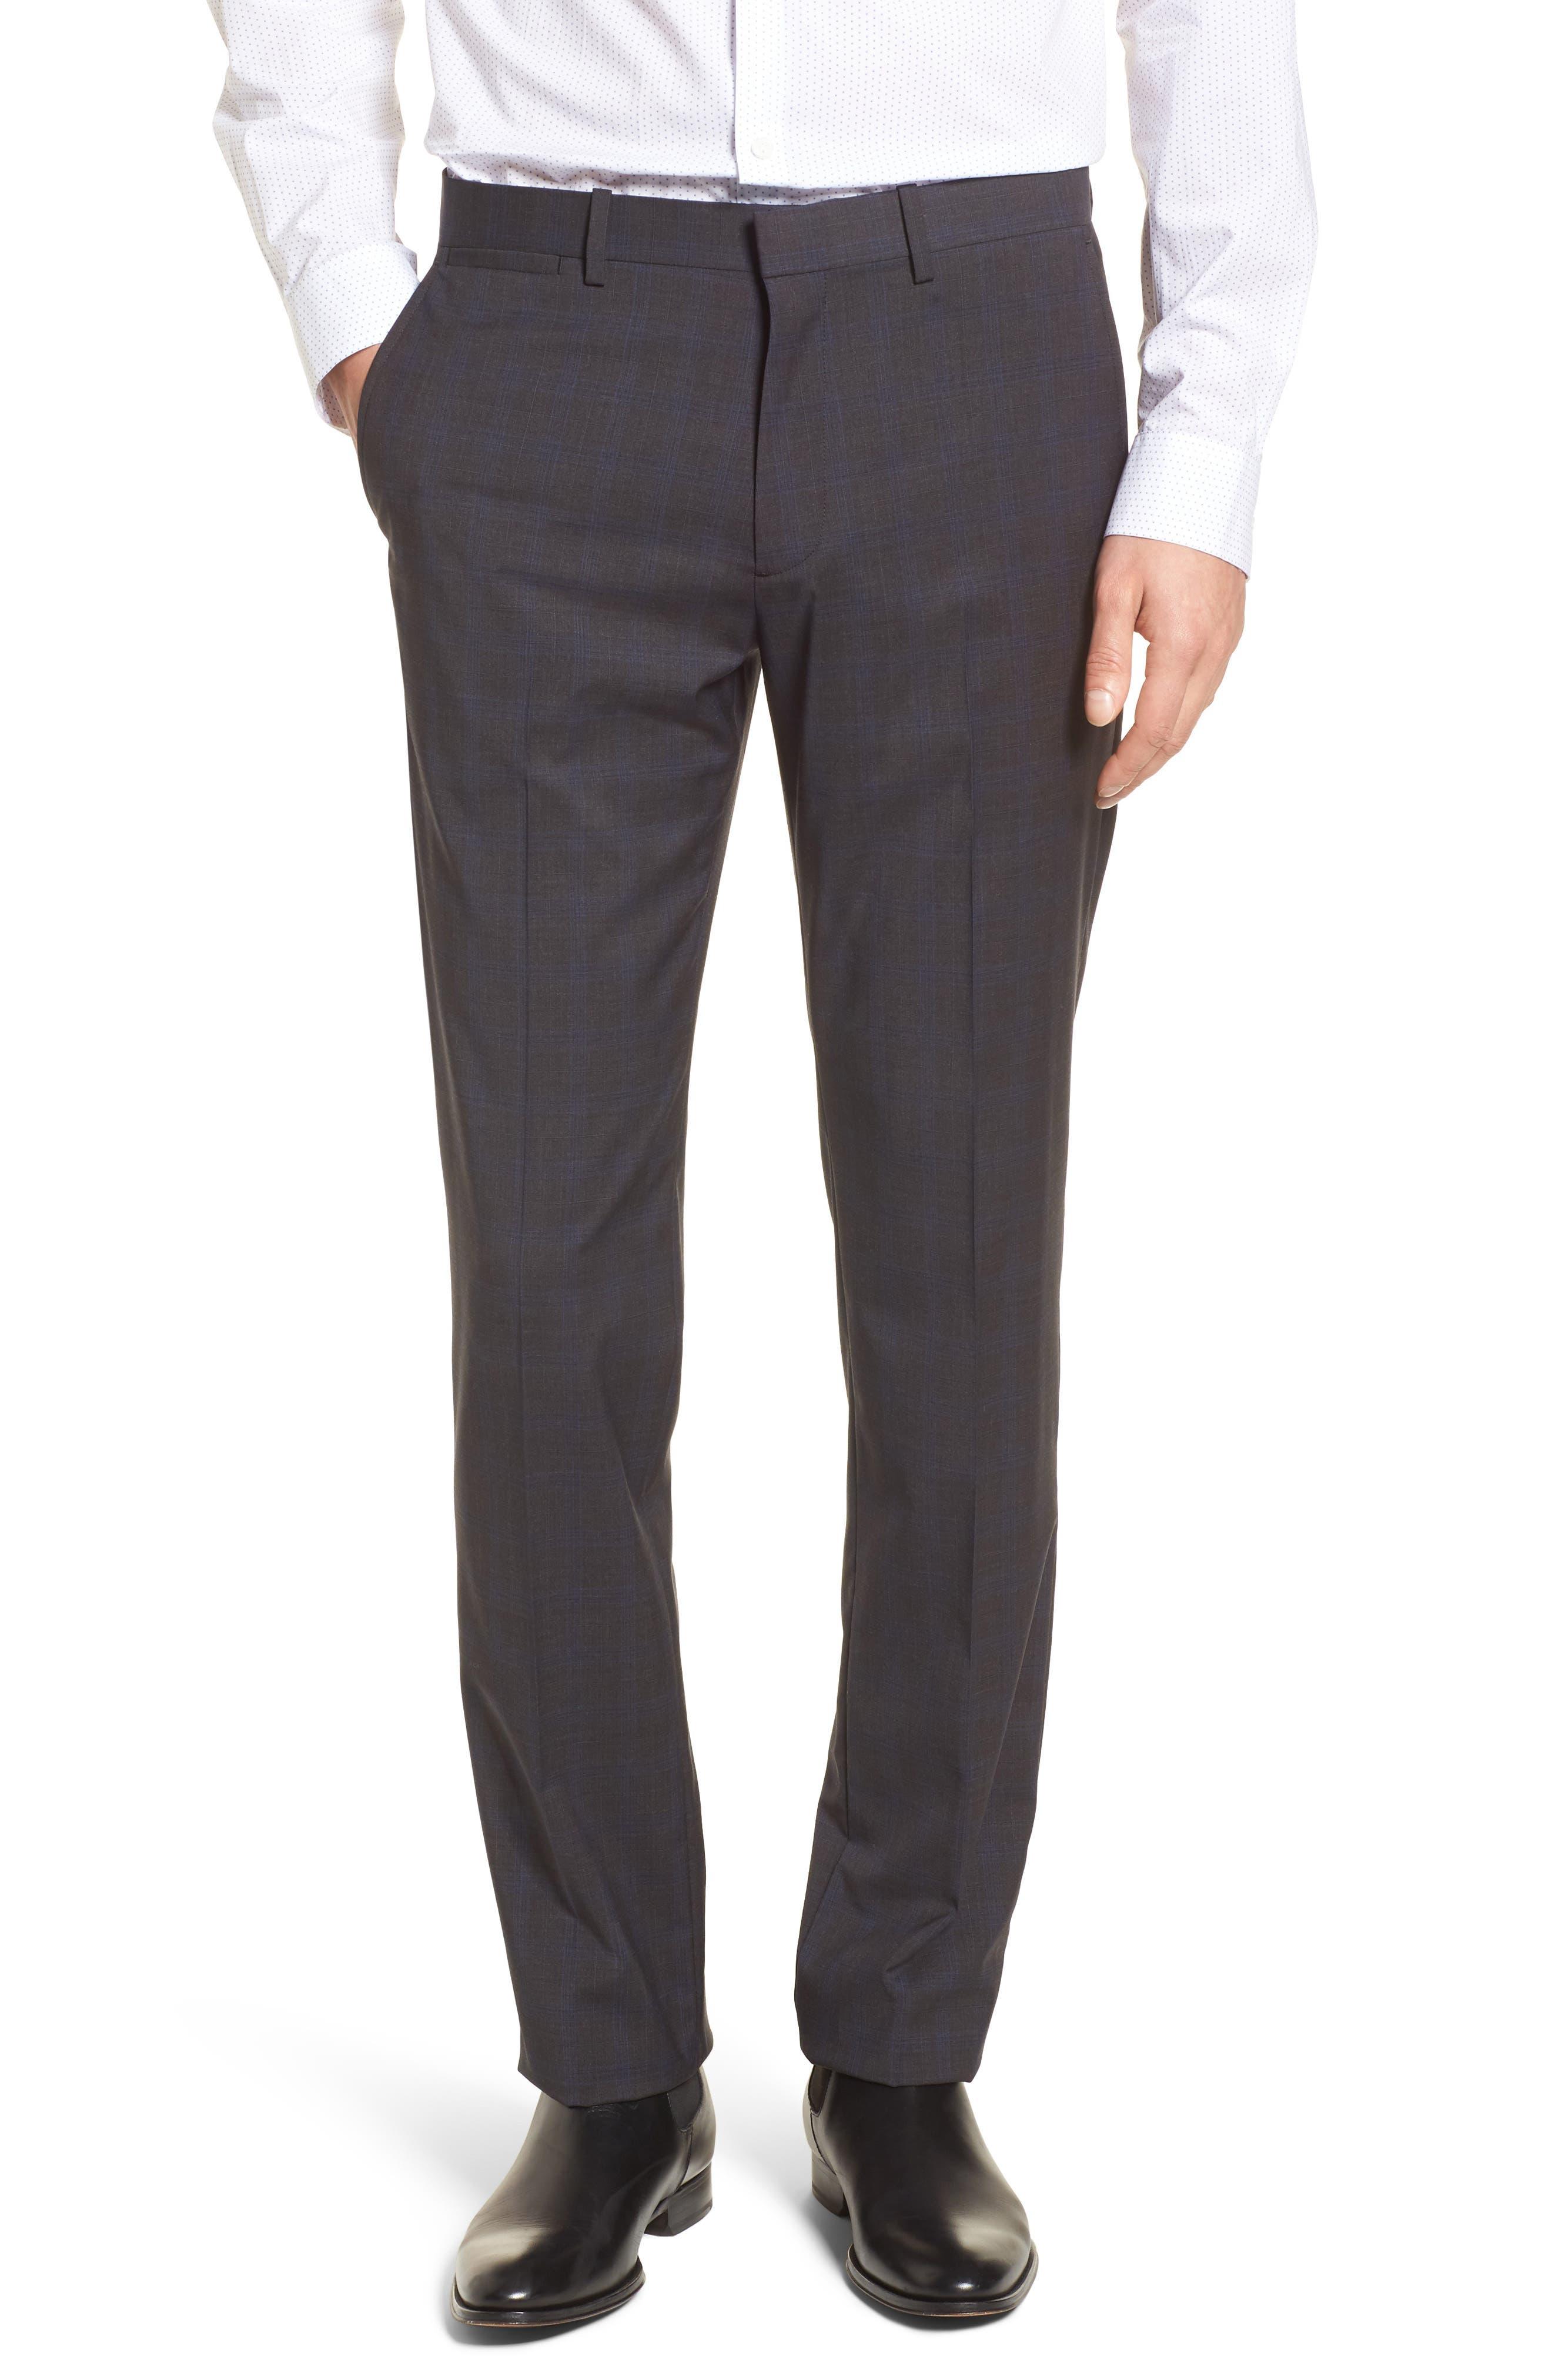 Marlo Trim Fit Tonal Plaid Trousers,                         Main,                         color, Charcoal Multi